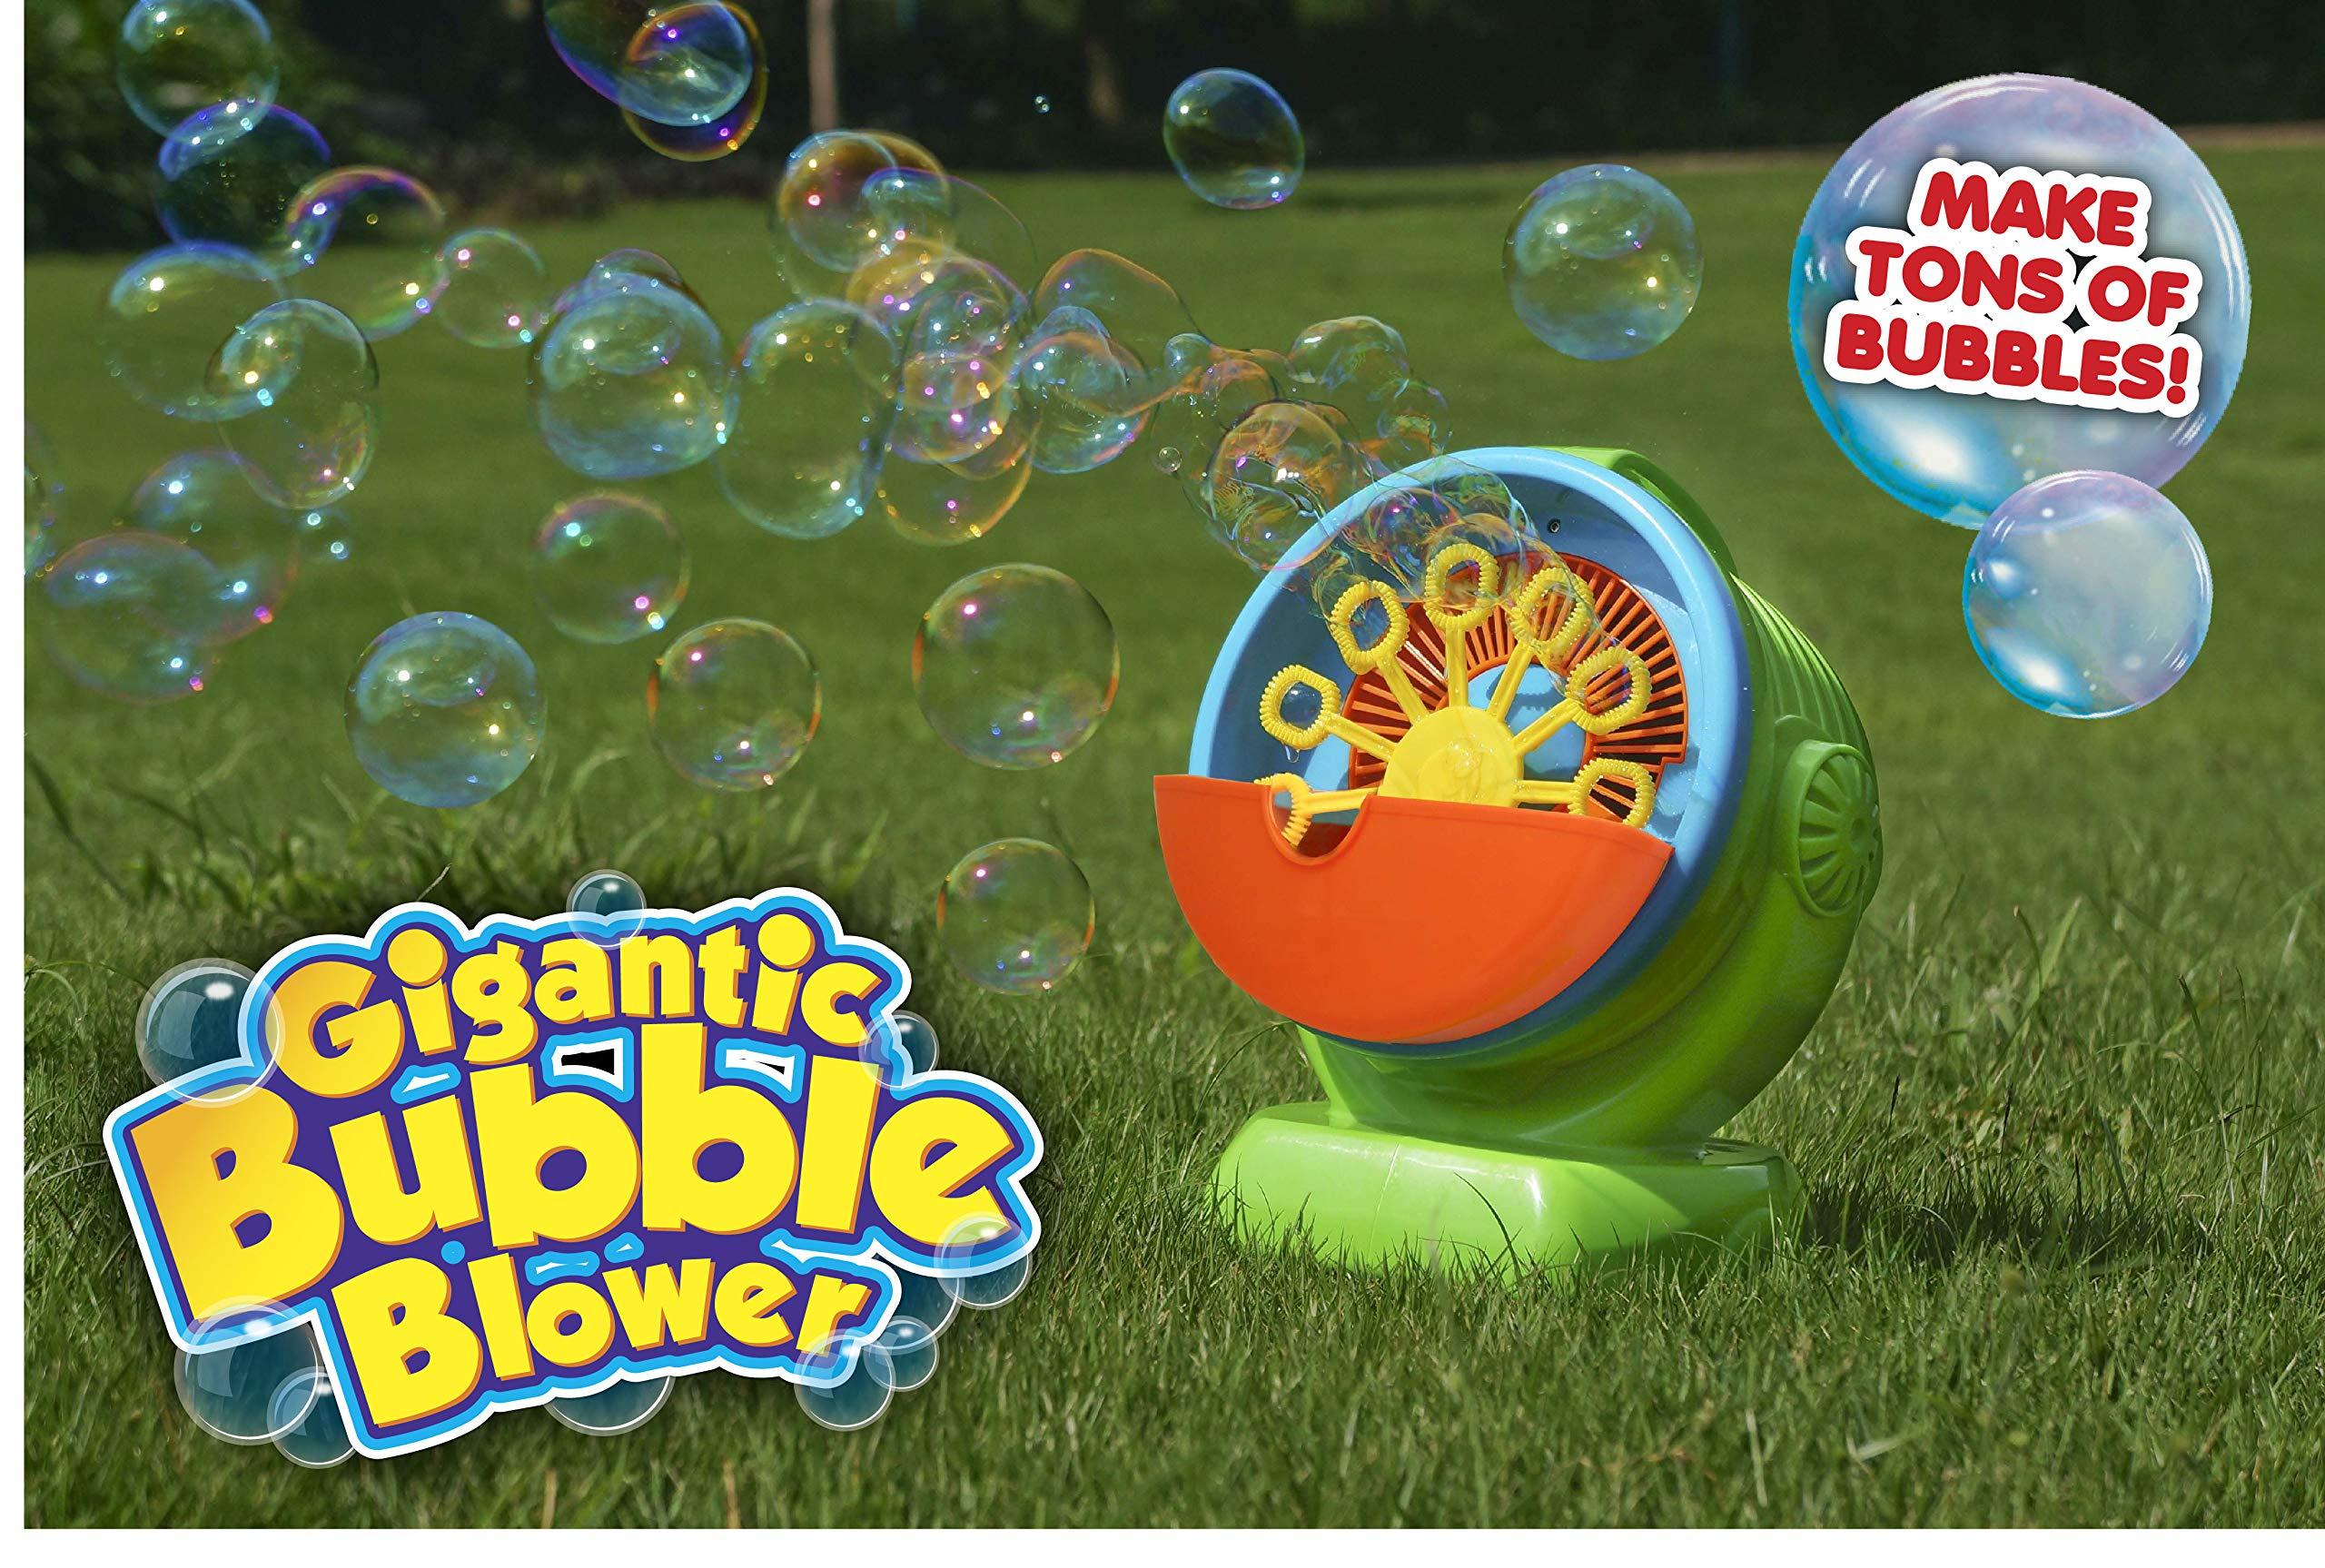 Gigantic Bubble Machine, Automatic Bubble Blower, Motorized, Portable